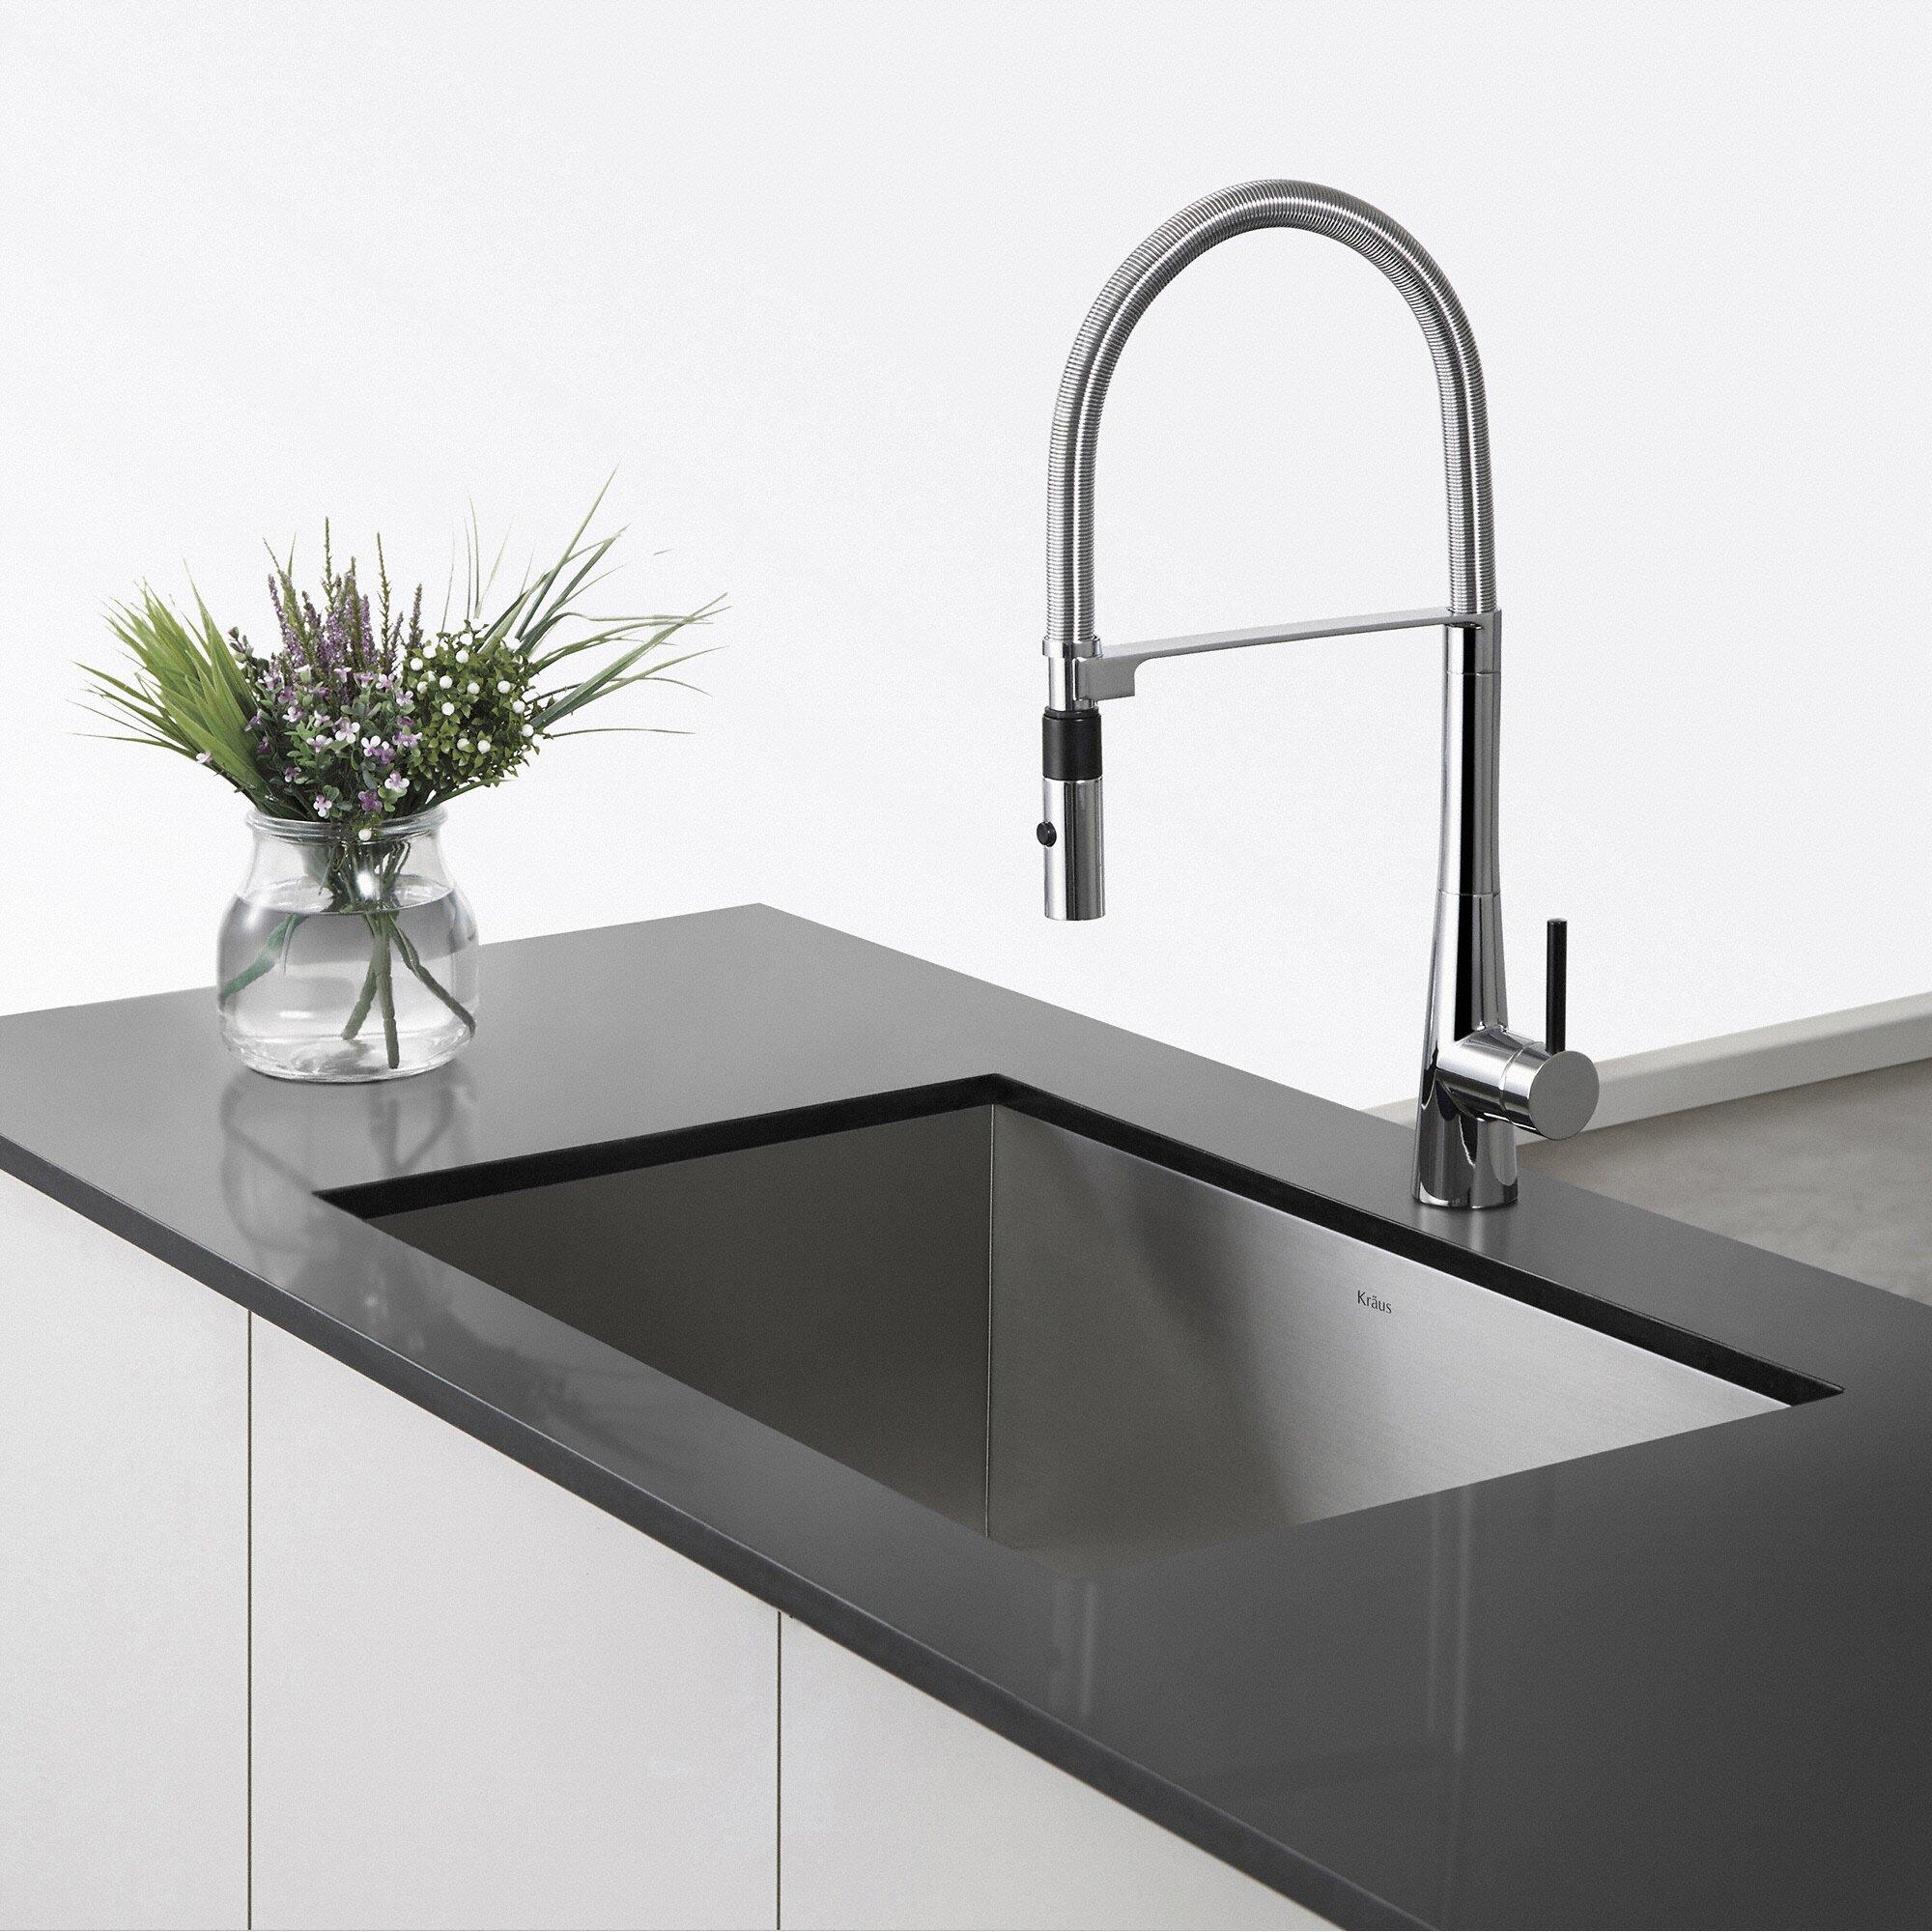 Handmade Stainless Steel Sink : ... Handmade Undermount Single Bowl Stainless Steel Kitchen Sink & Reviews